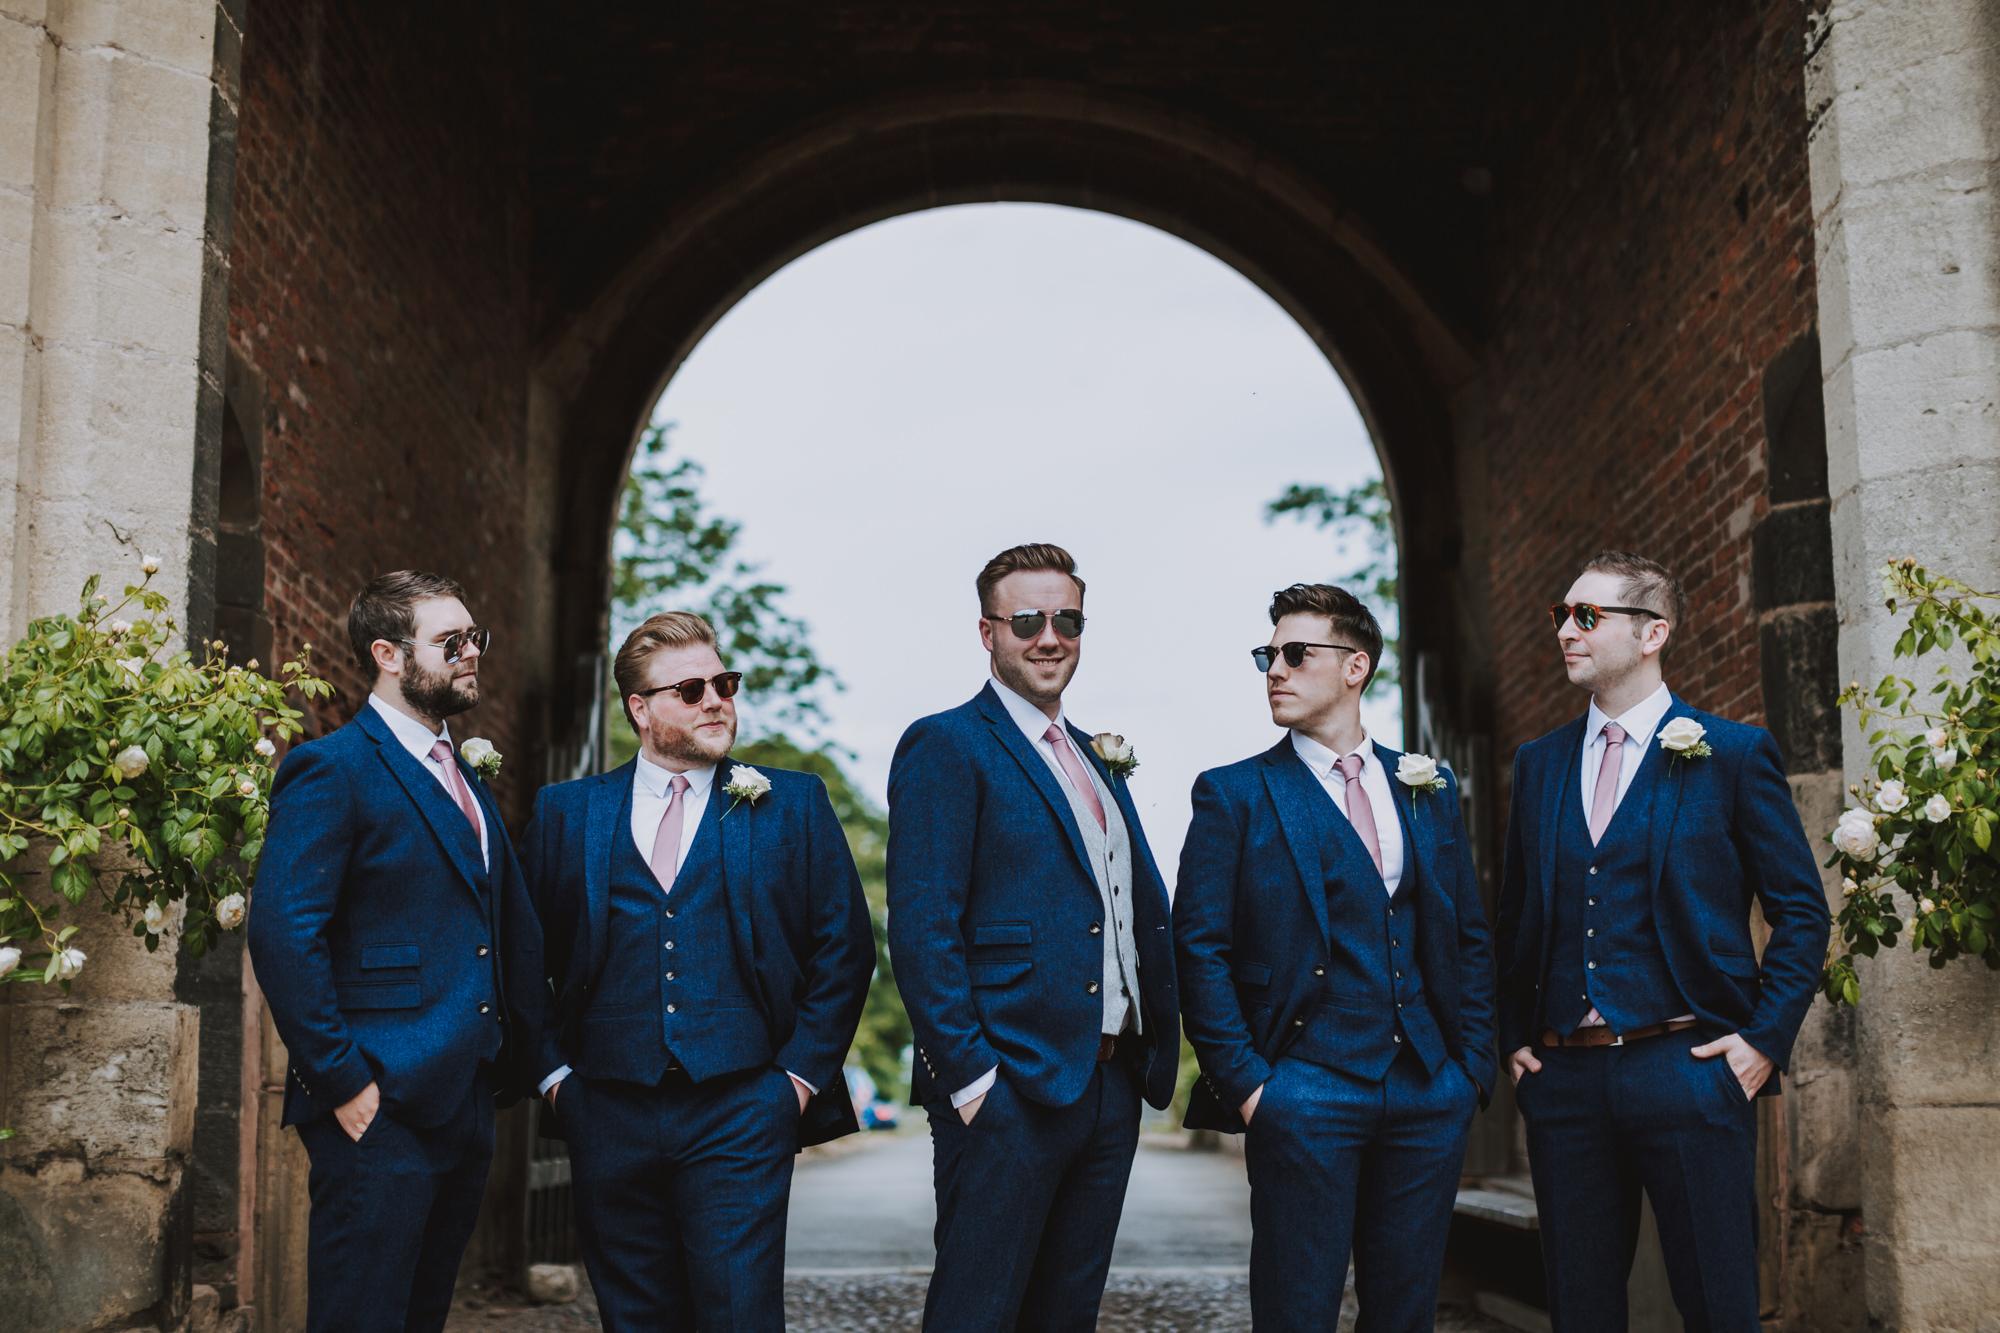 hodsock priory wedding photographers blog16.jpg